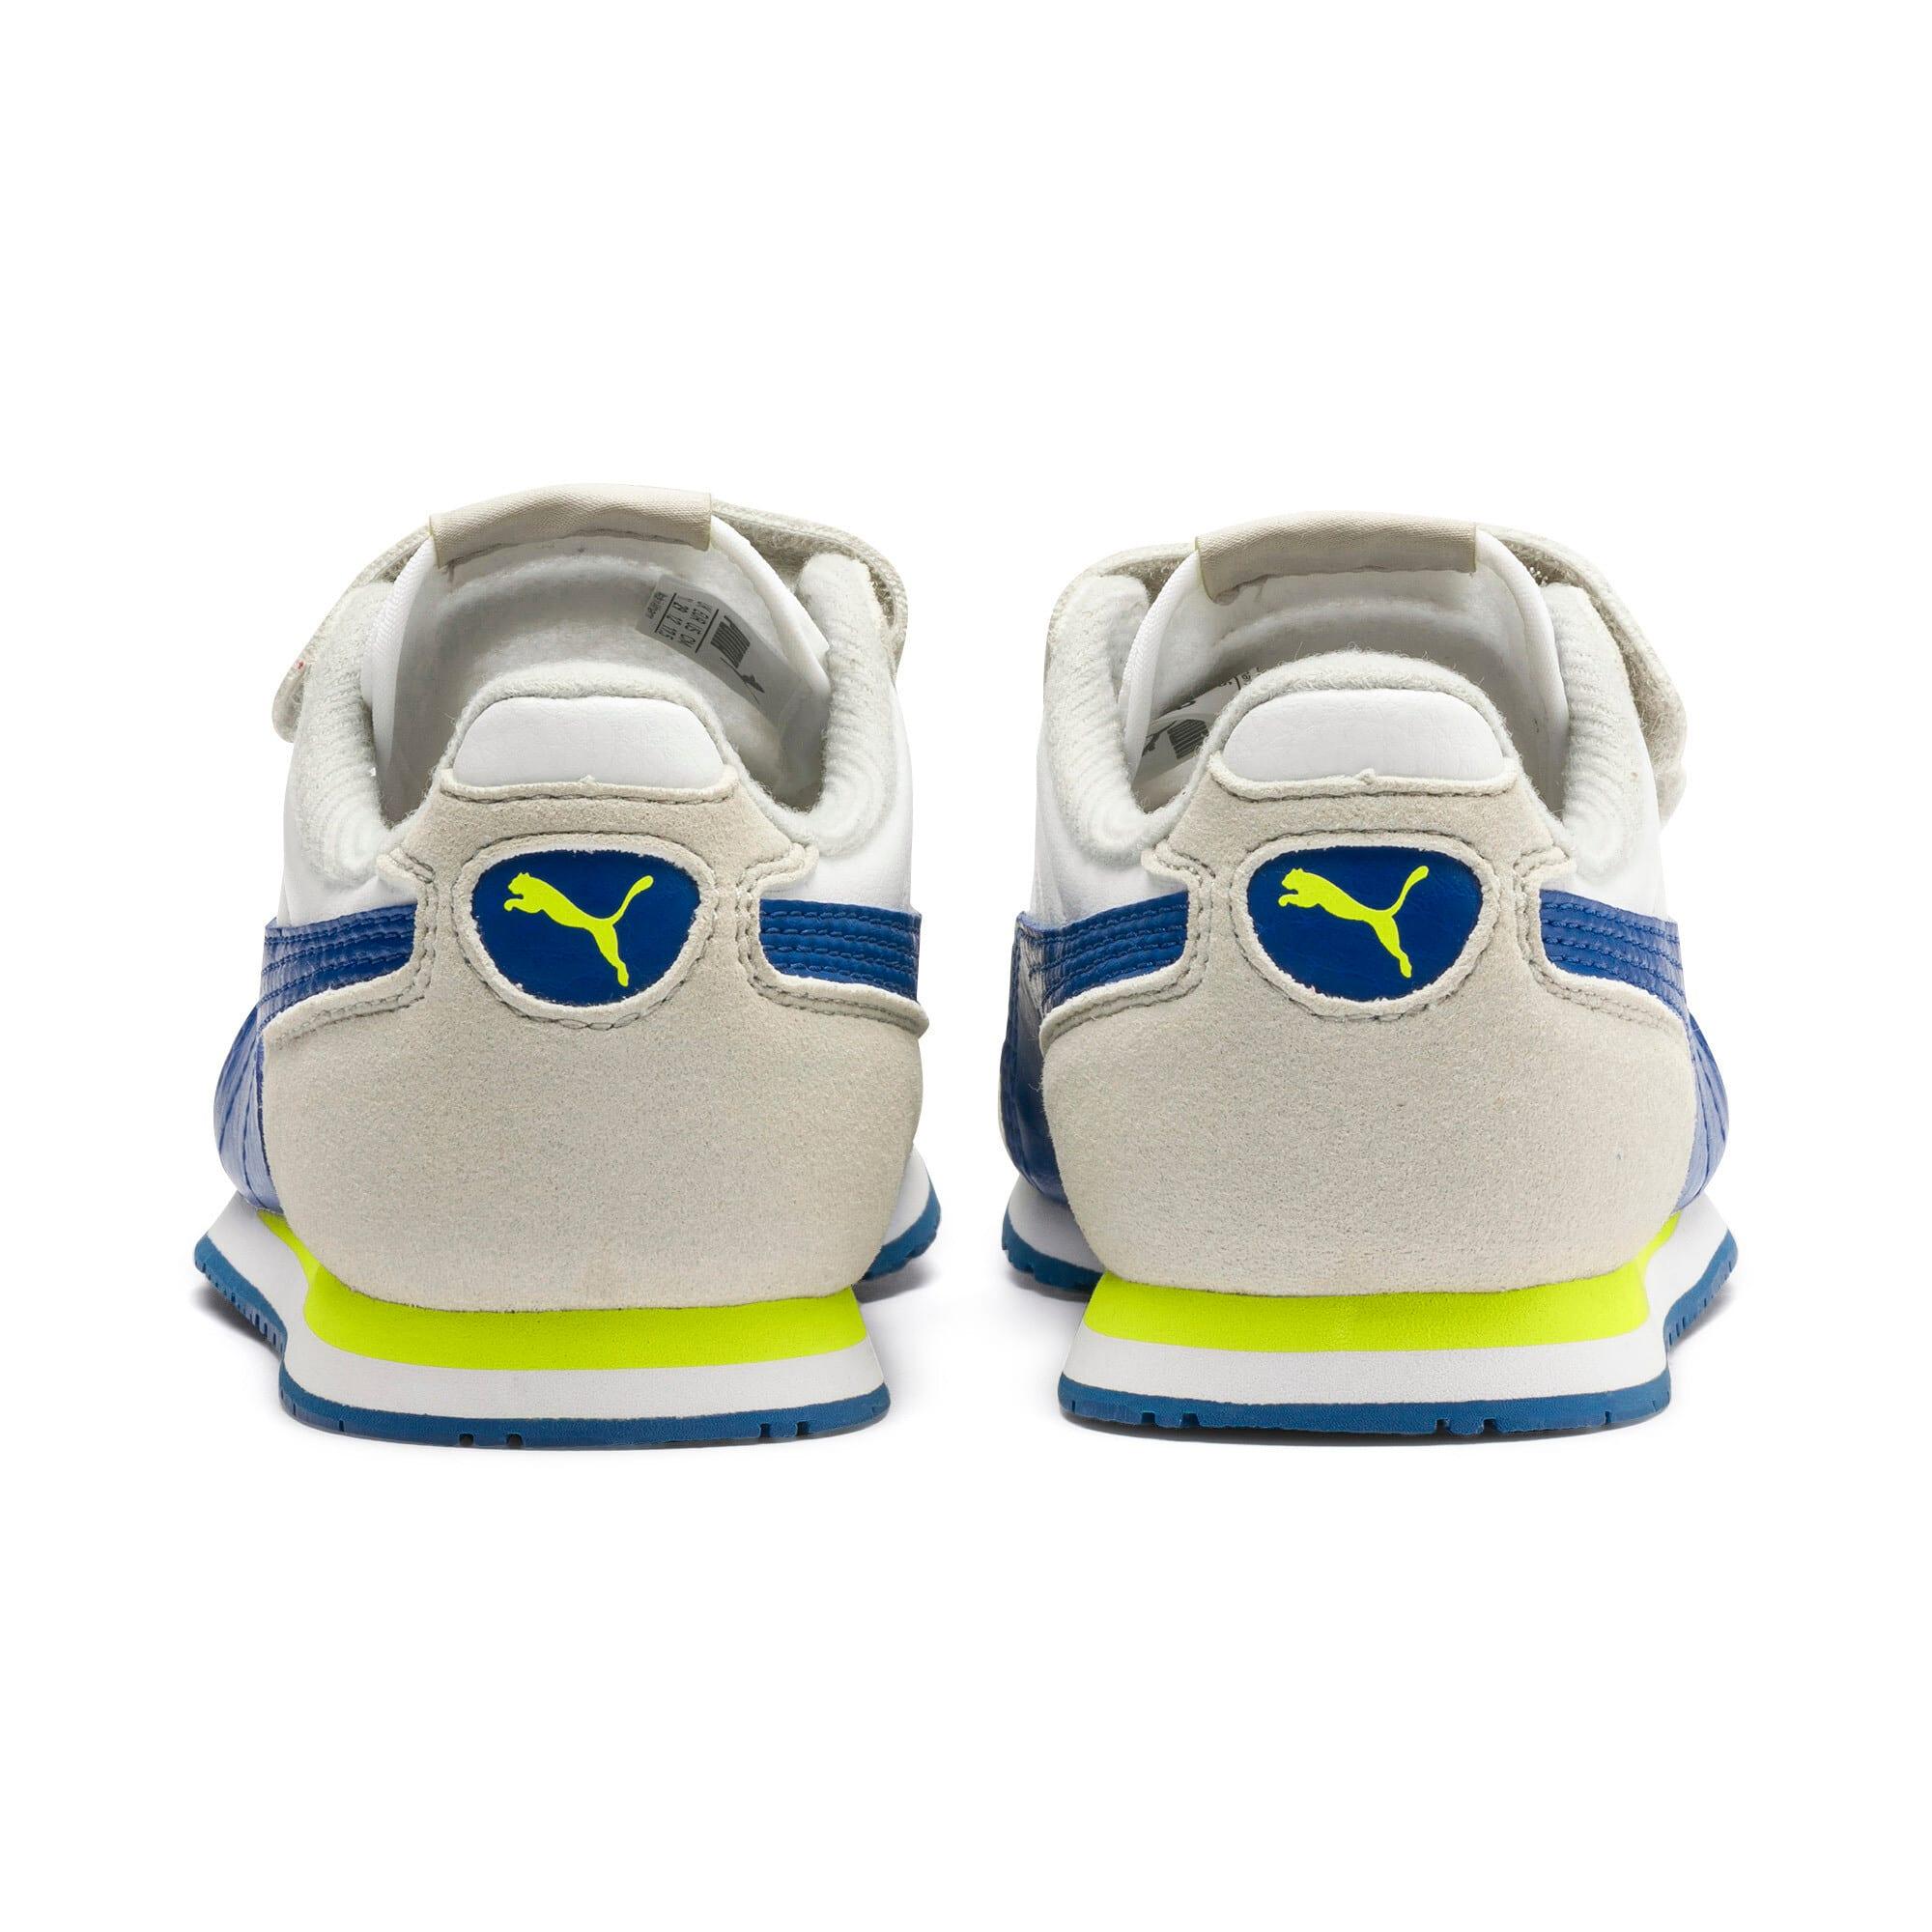 Thumbnail 3 of Cabana Racer SL V PS Baby Sneaker, Puma White-Galaxy Blue, medium